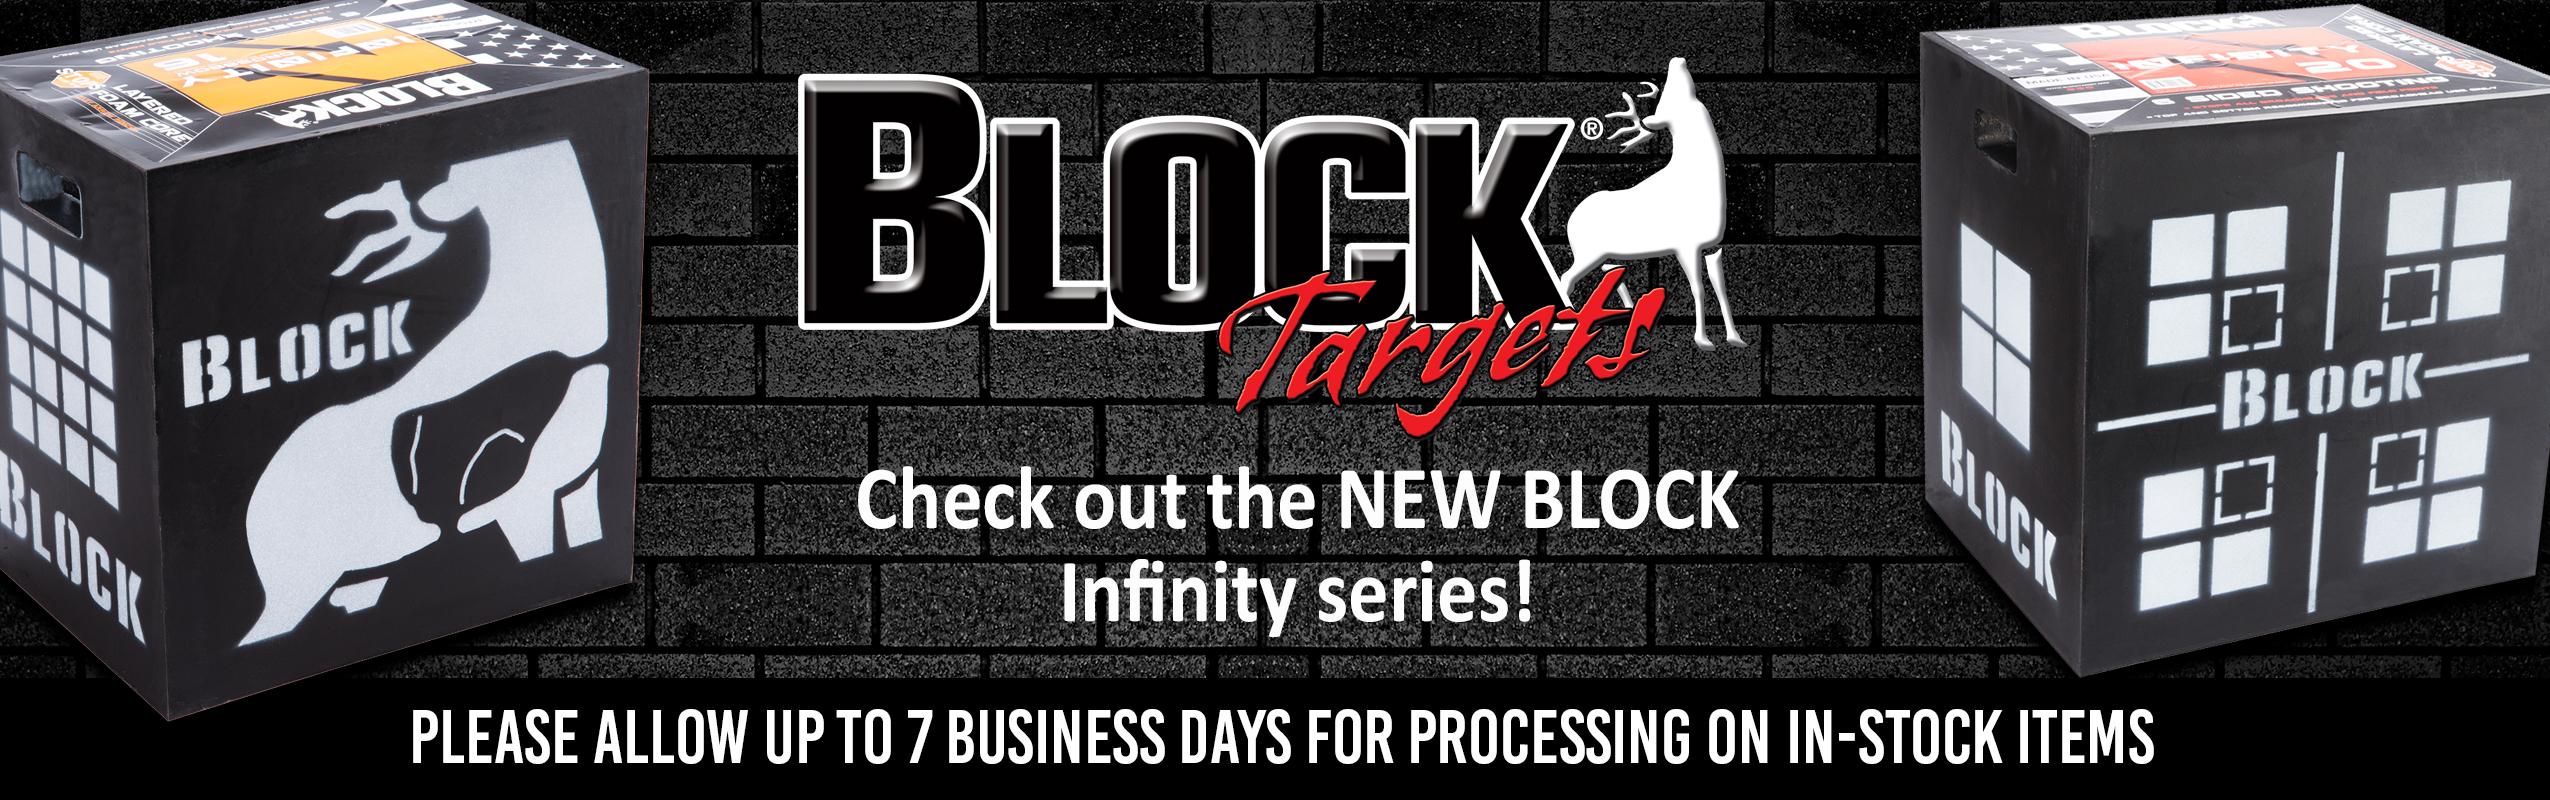 BLOCK Targets Banner